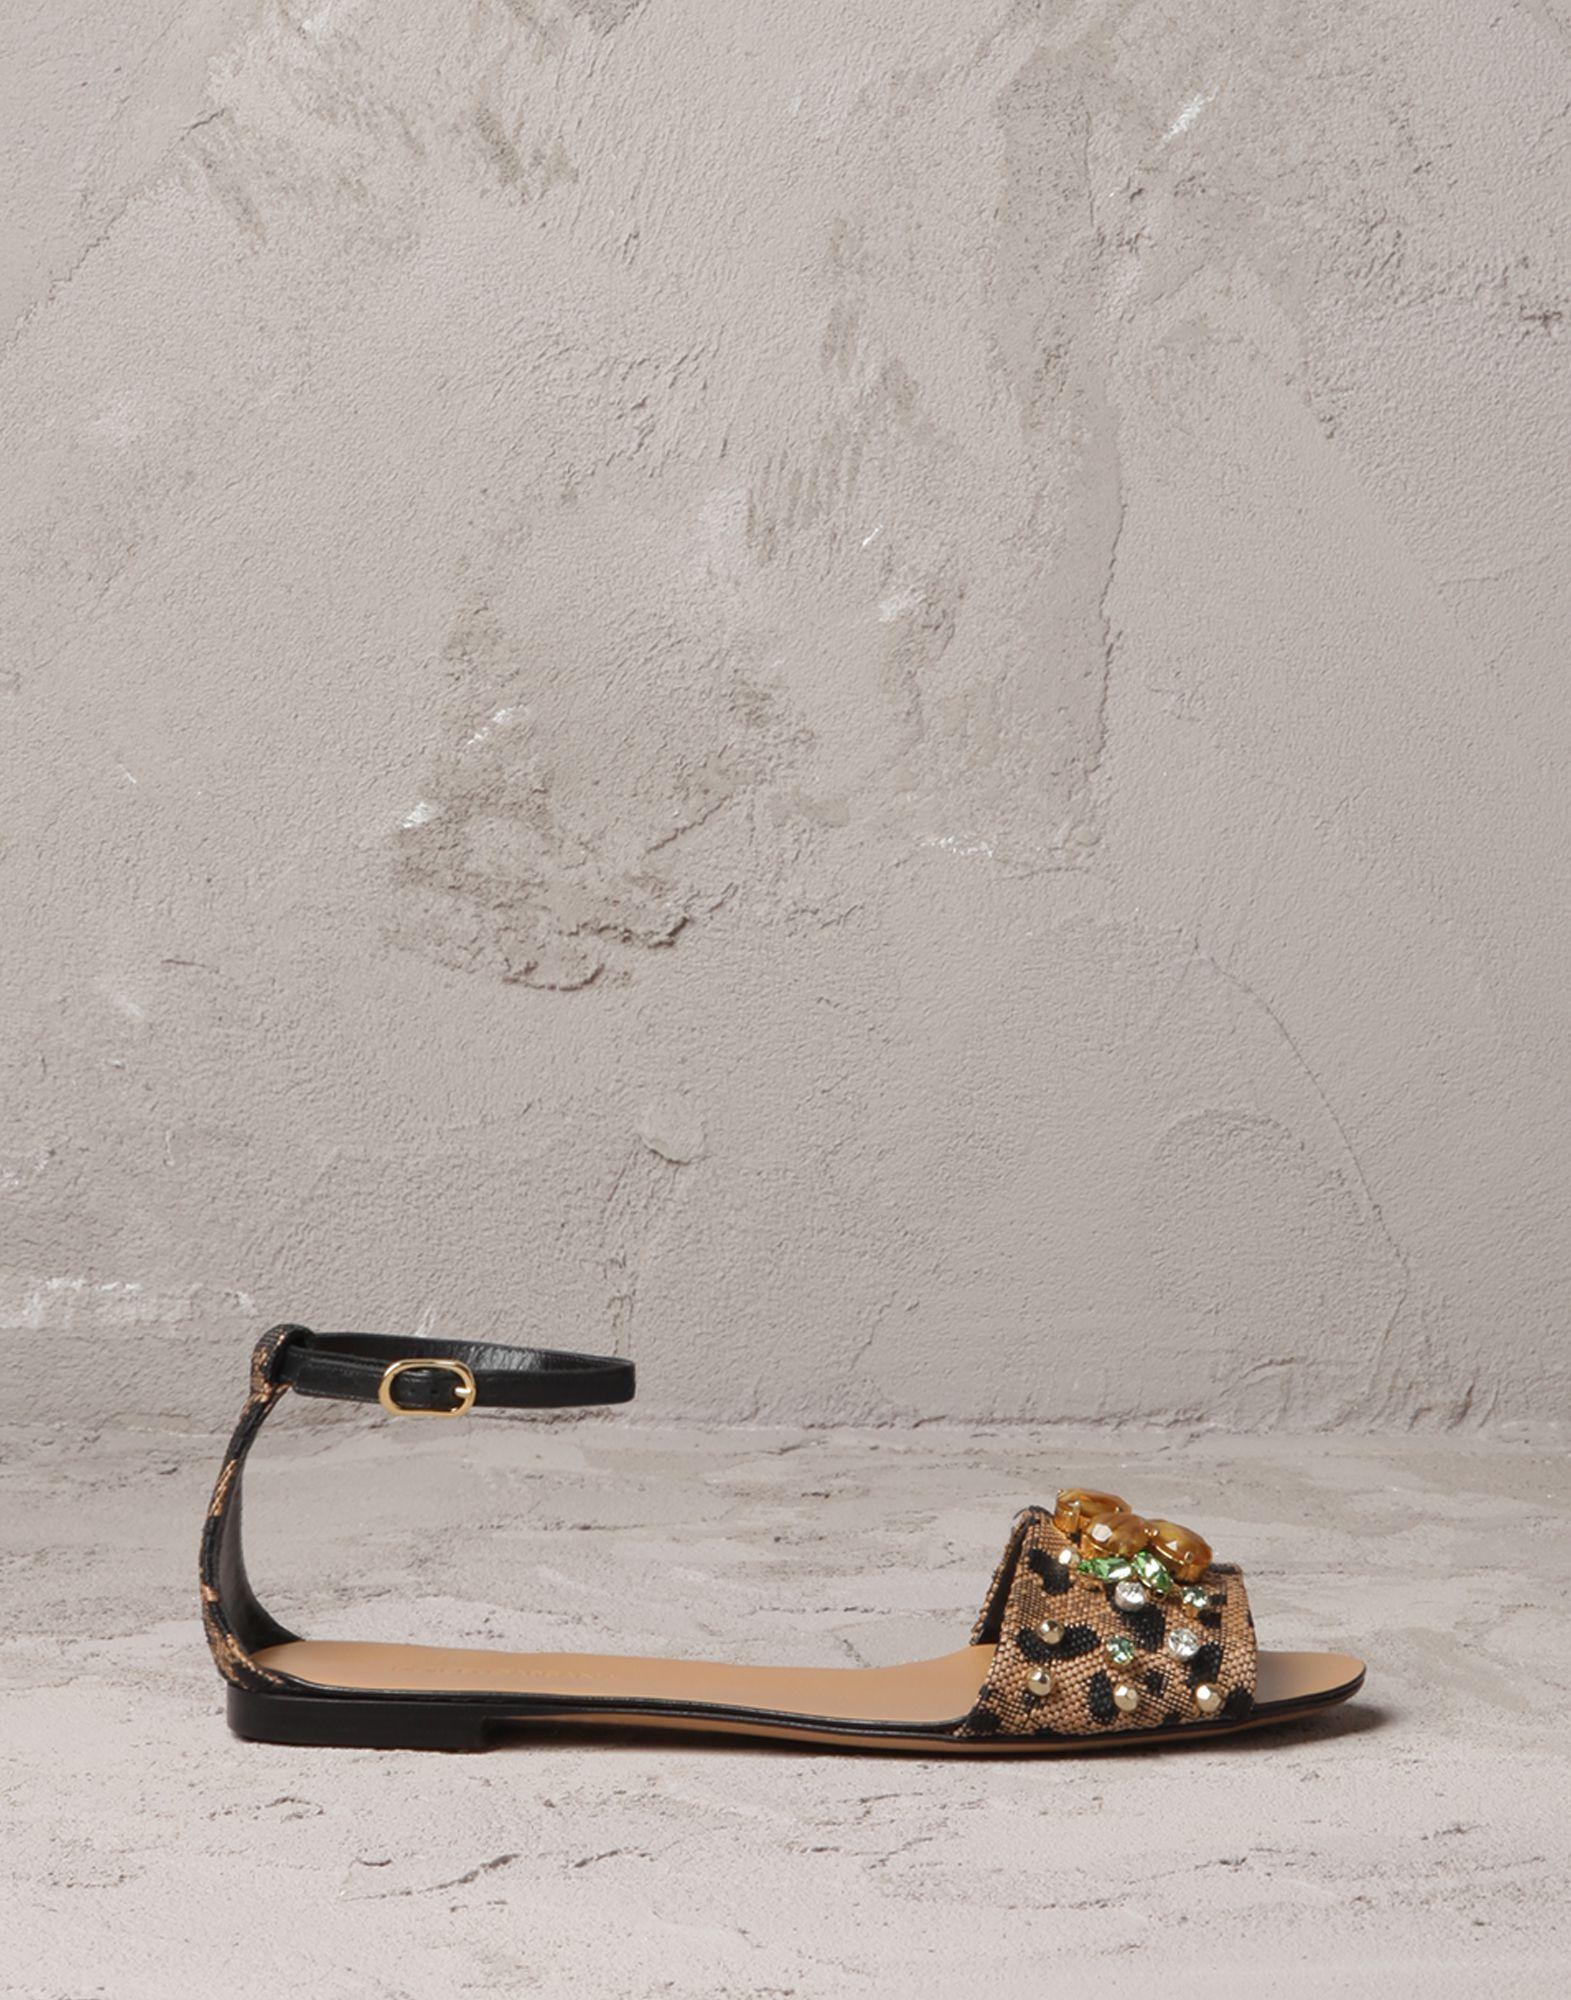 589071ec9 Dolce   Gabbana Raffia Leopard Print Sandal with gems and embroidery ...